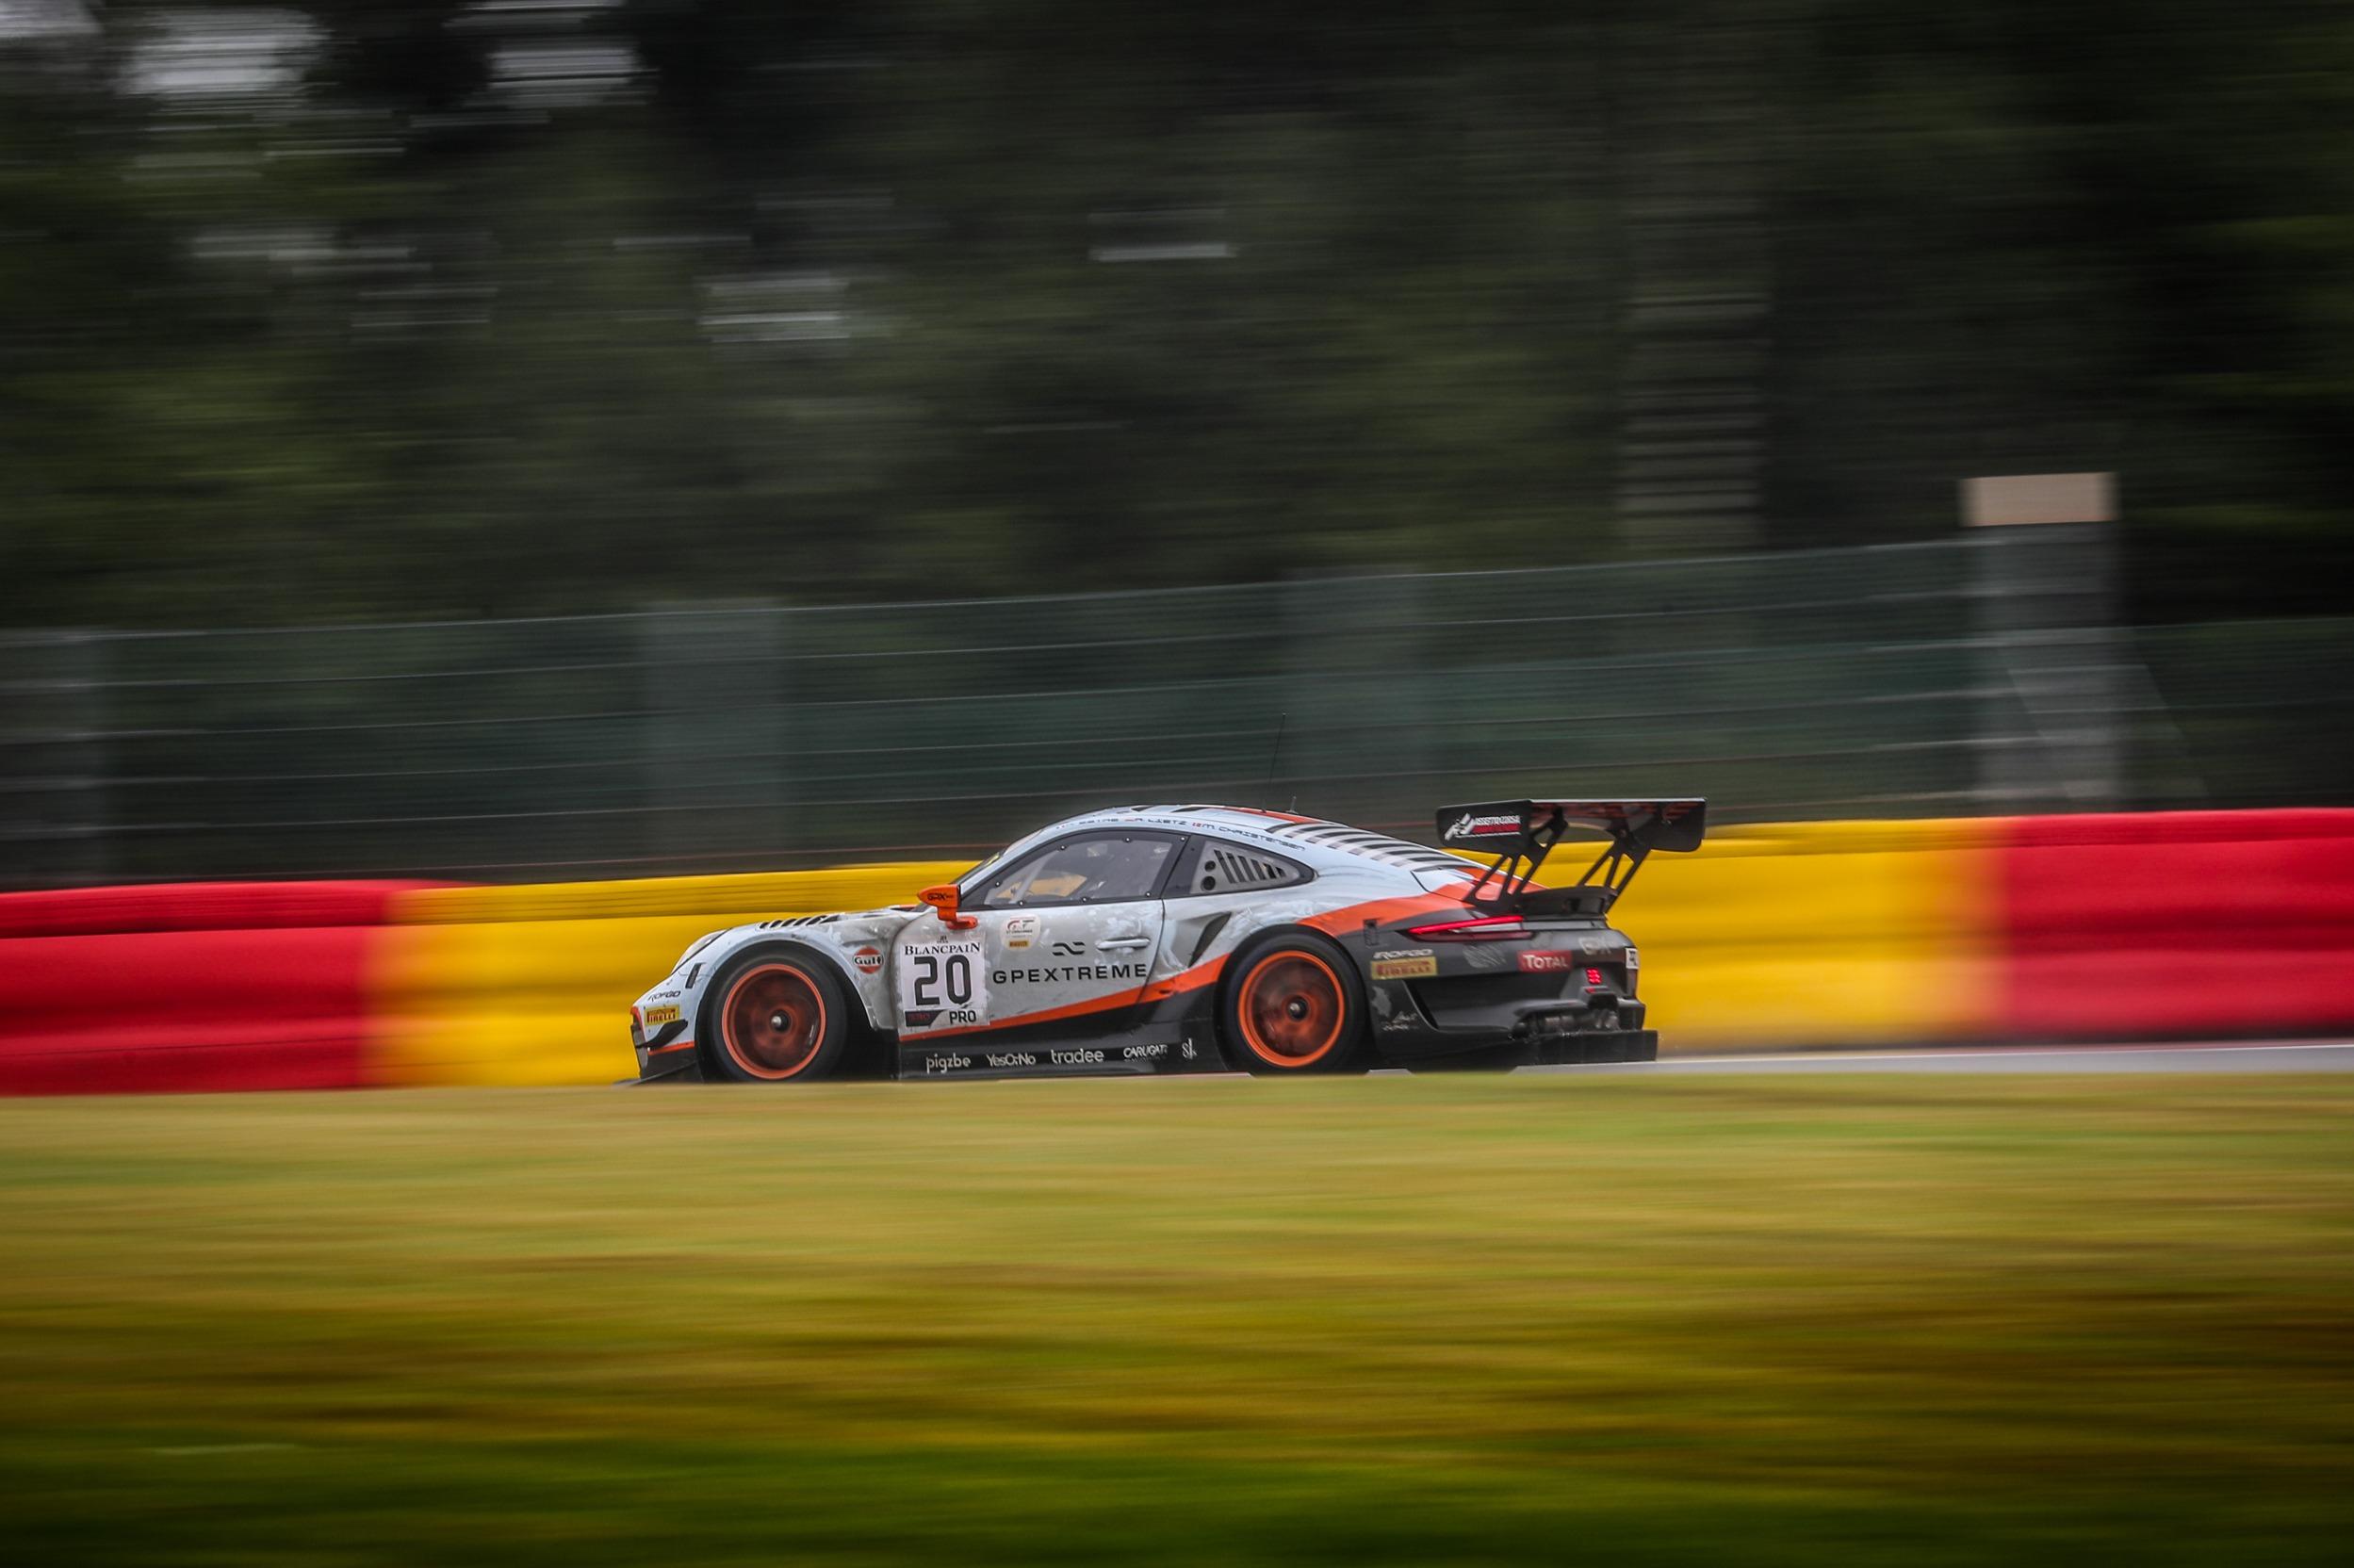 GPX Racing, 2019 Spa 24 Hours